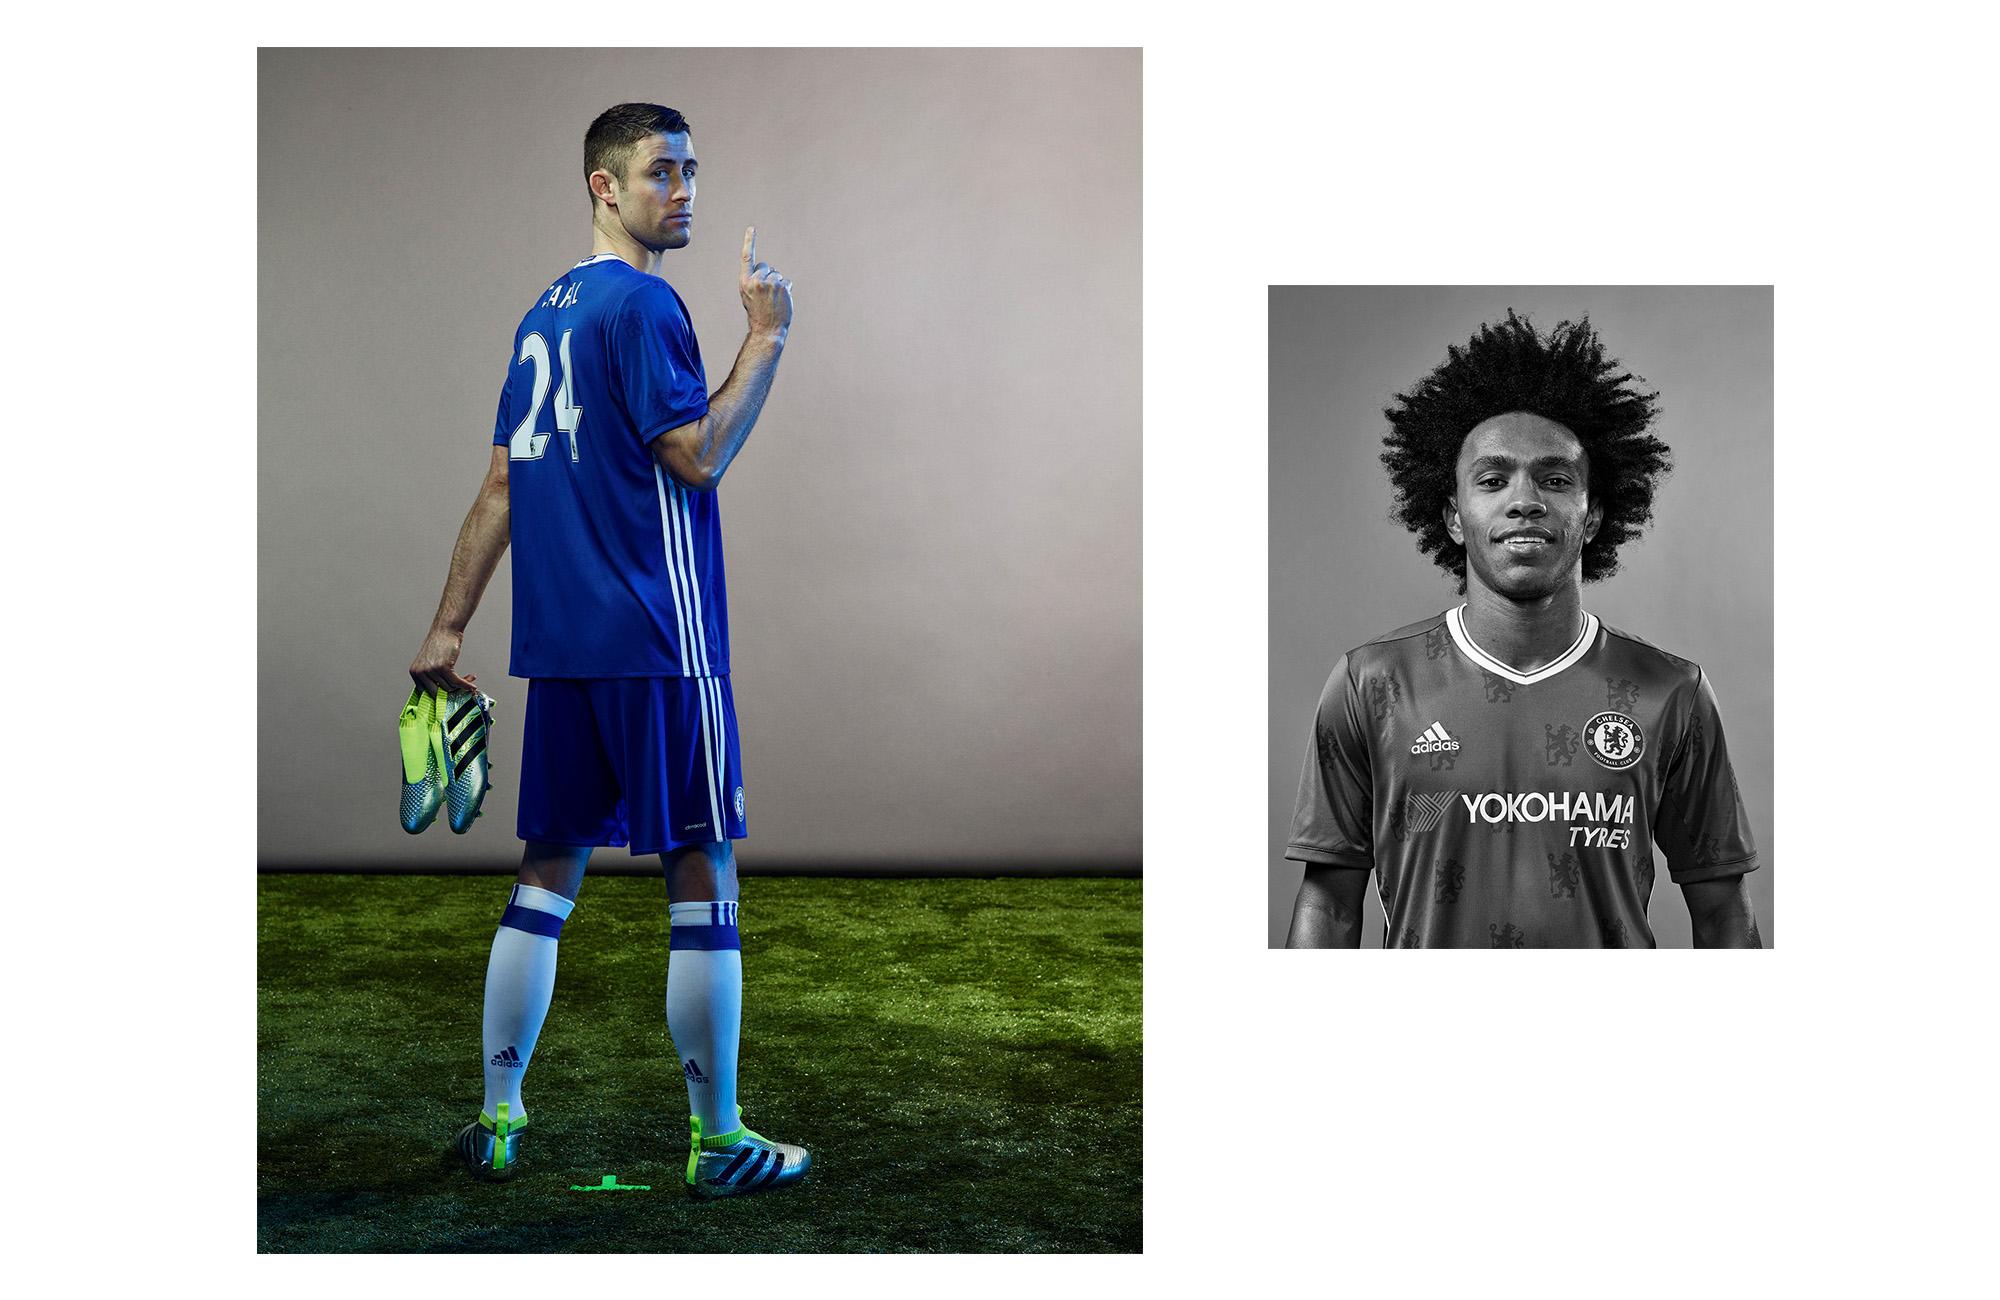 Super Chelsea - 2 of 6